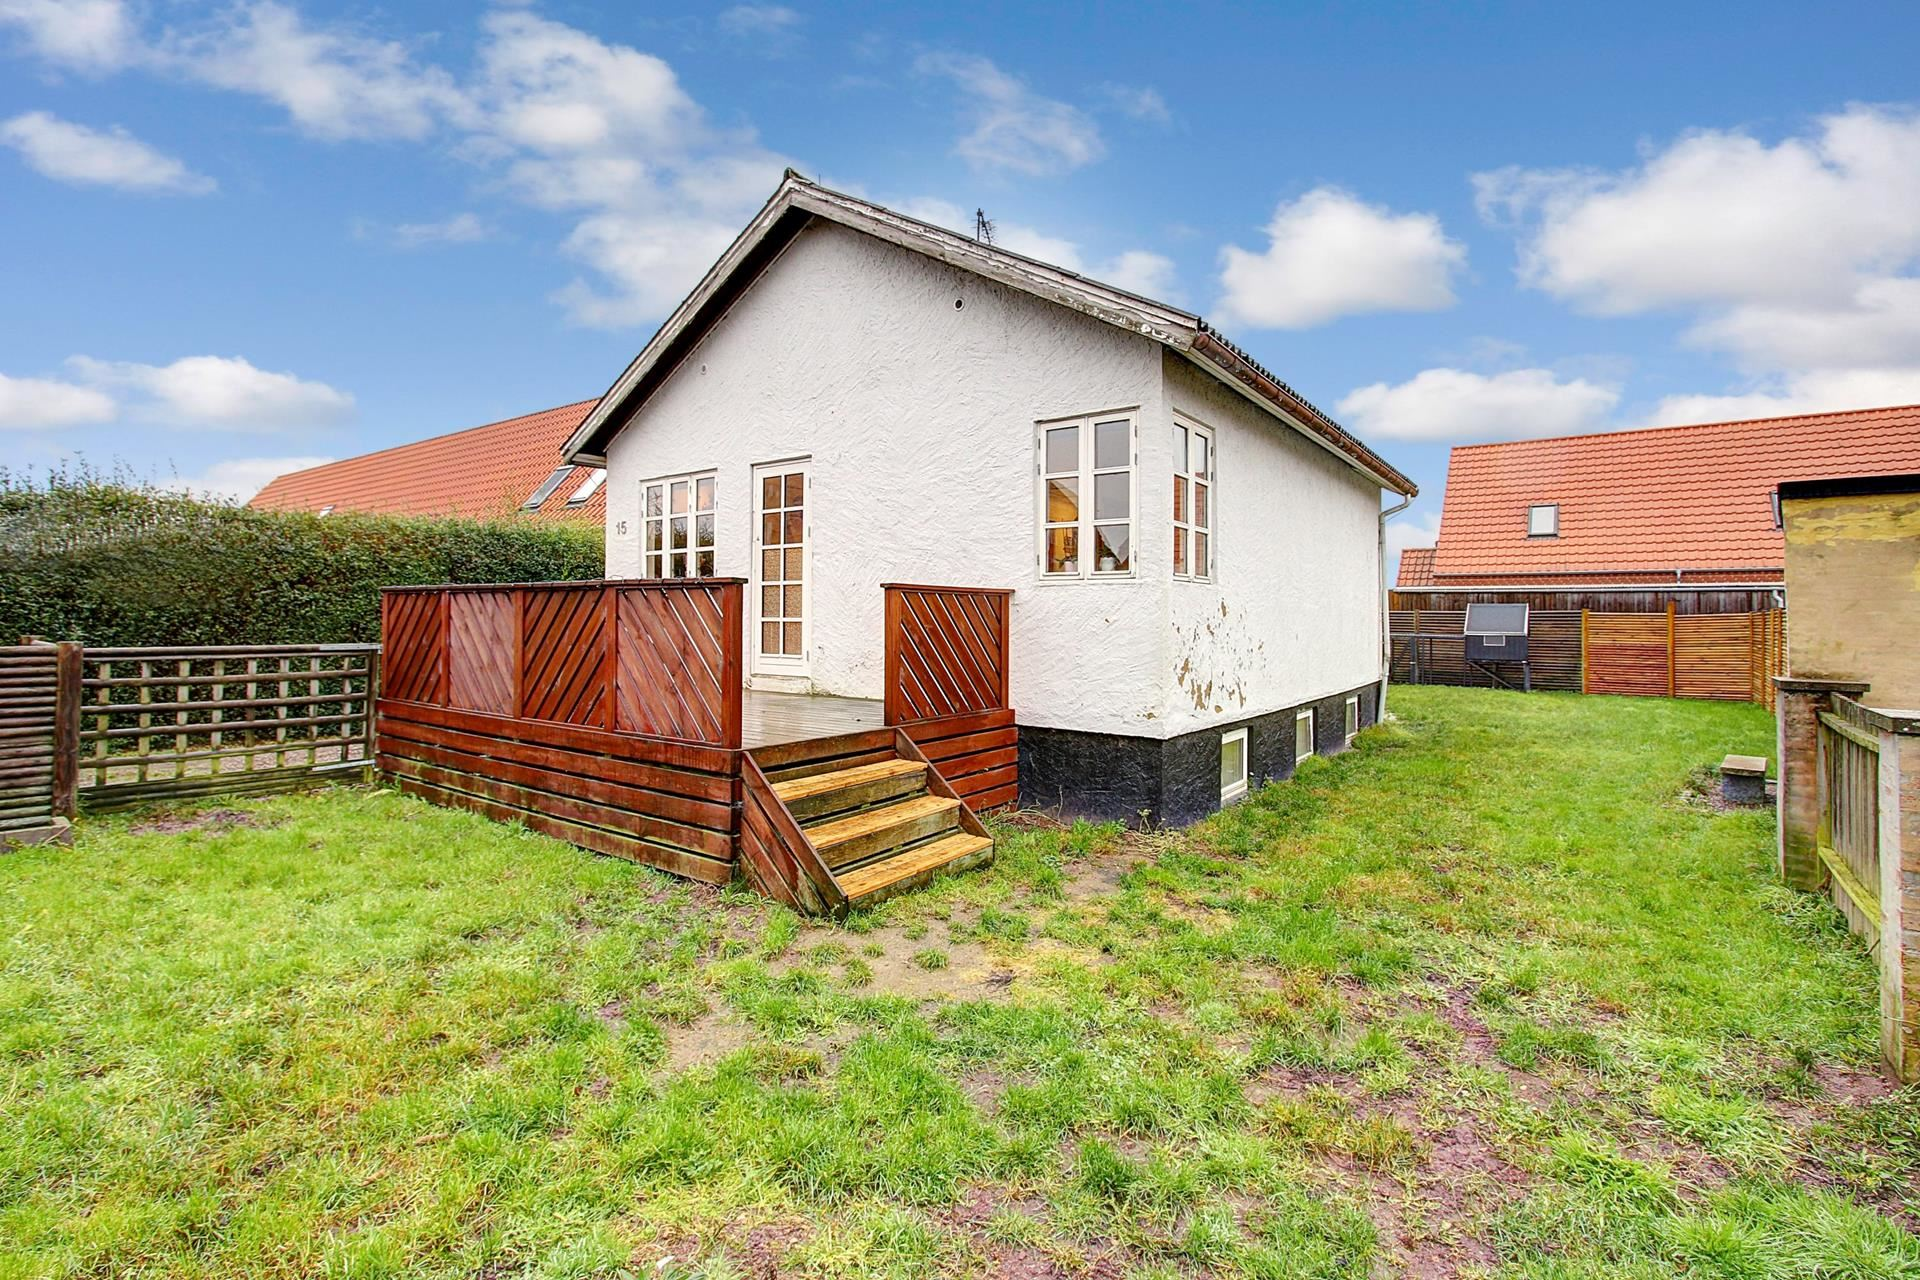 Bygaden 15, Kundby, 4520 Svinninge